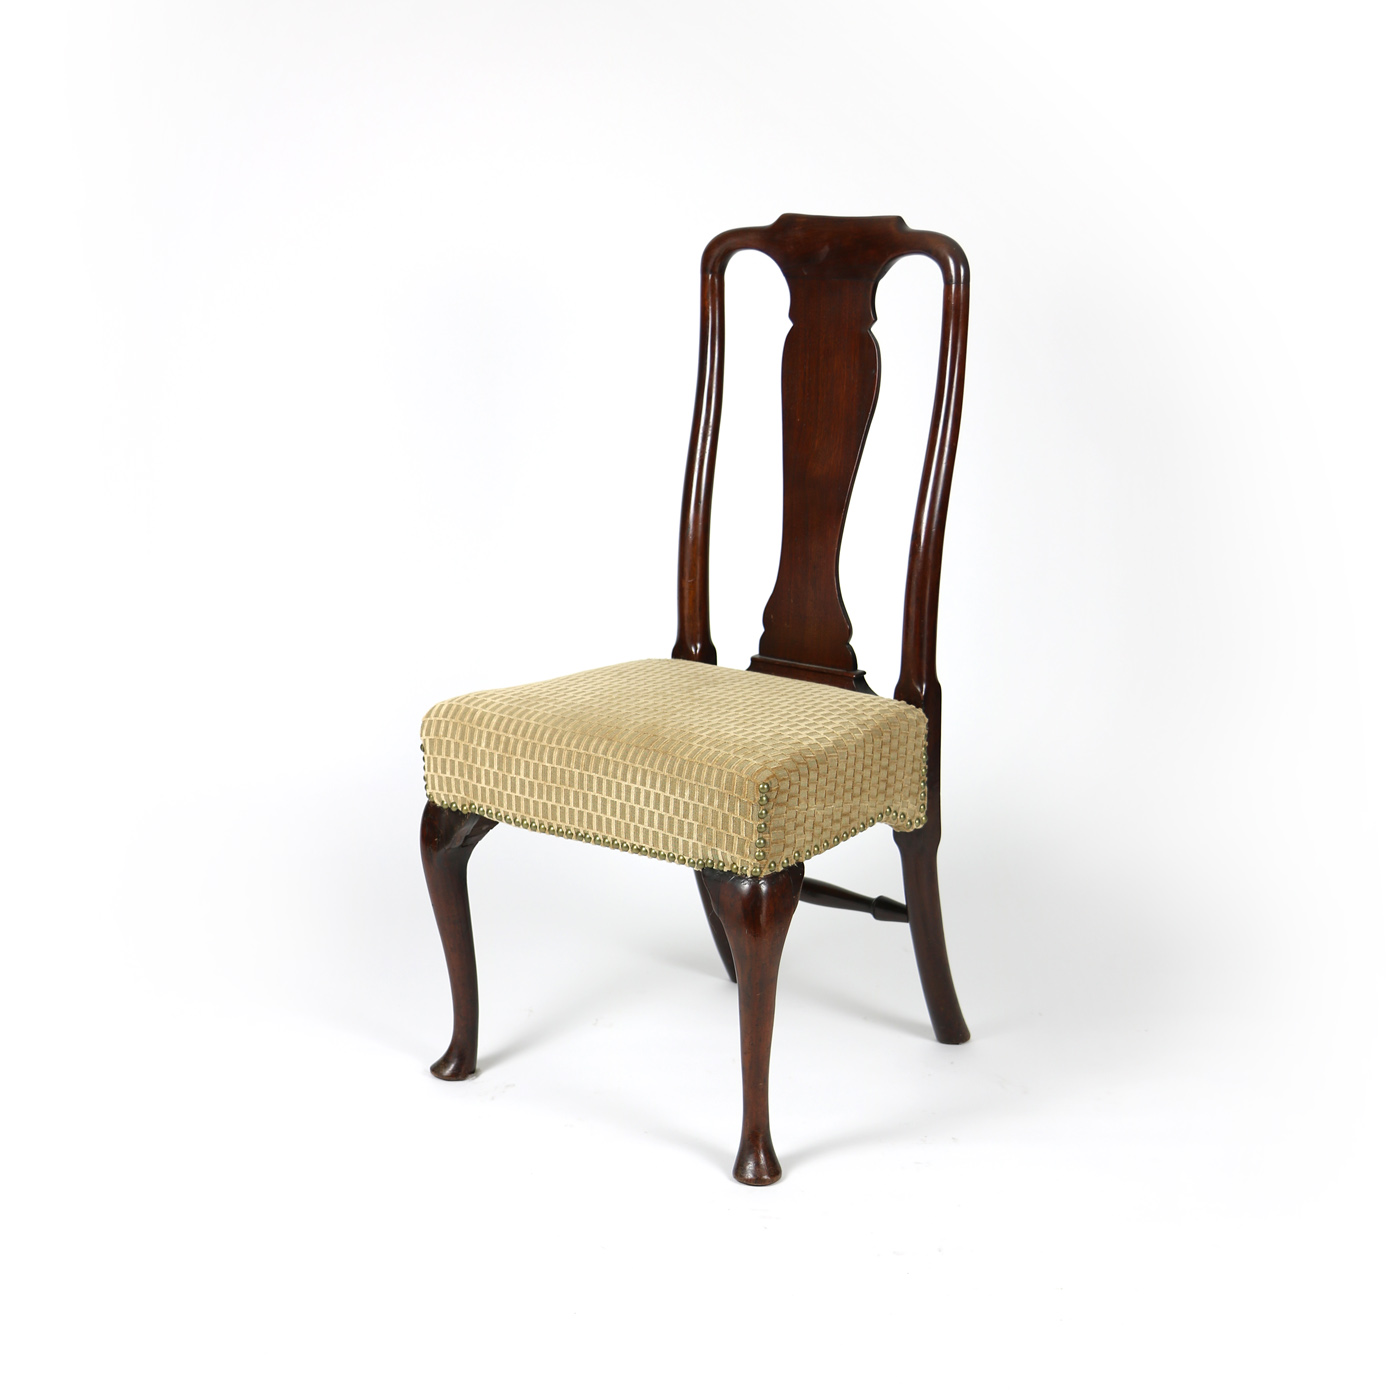 Garden Court Antiques, San Francisco 18th Century Walnut Dining Chair with Queen  Anne Legs, - 18th Century Walnut Dining Chair With Queen Anne Legs, English Cira